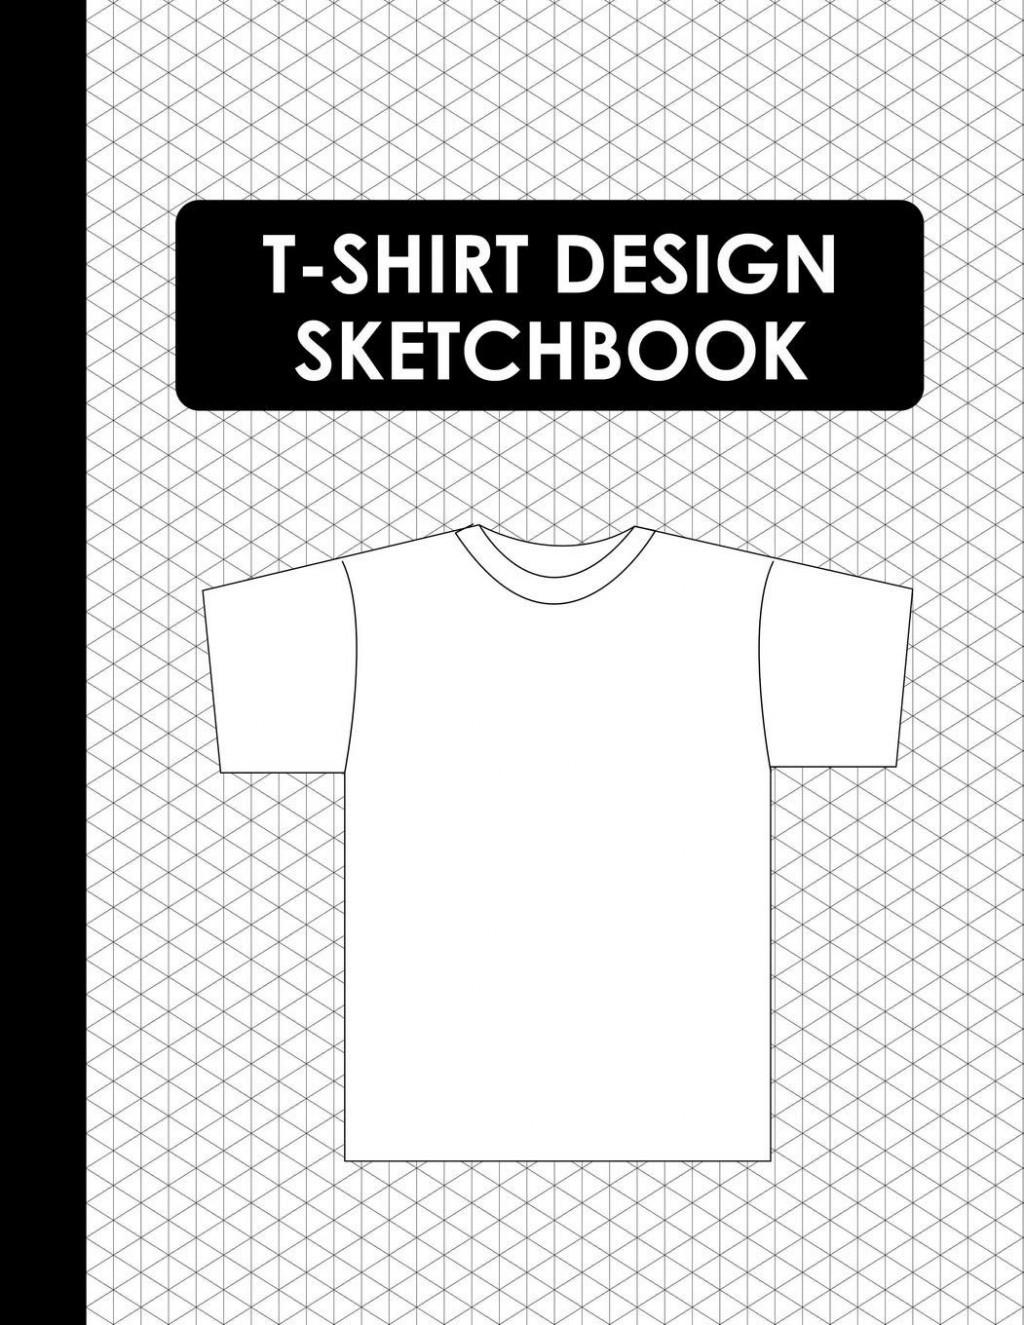 004 Unique T Shirt Template Design Picture  Psd Free Download EditableLarge